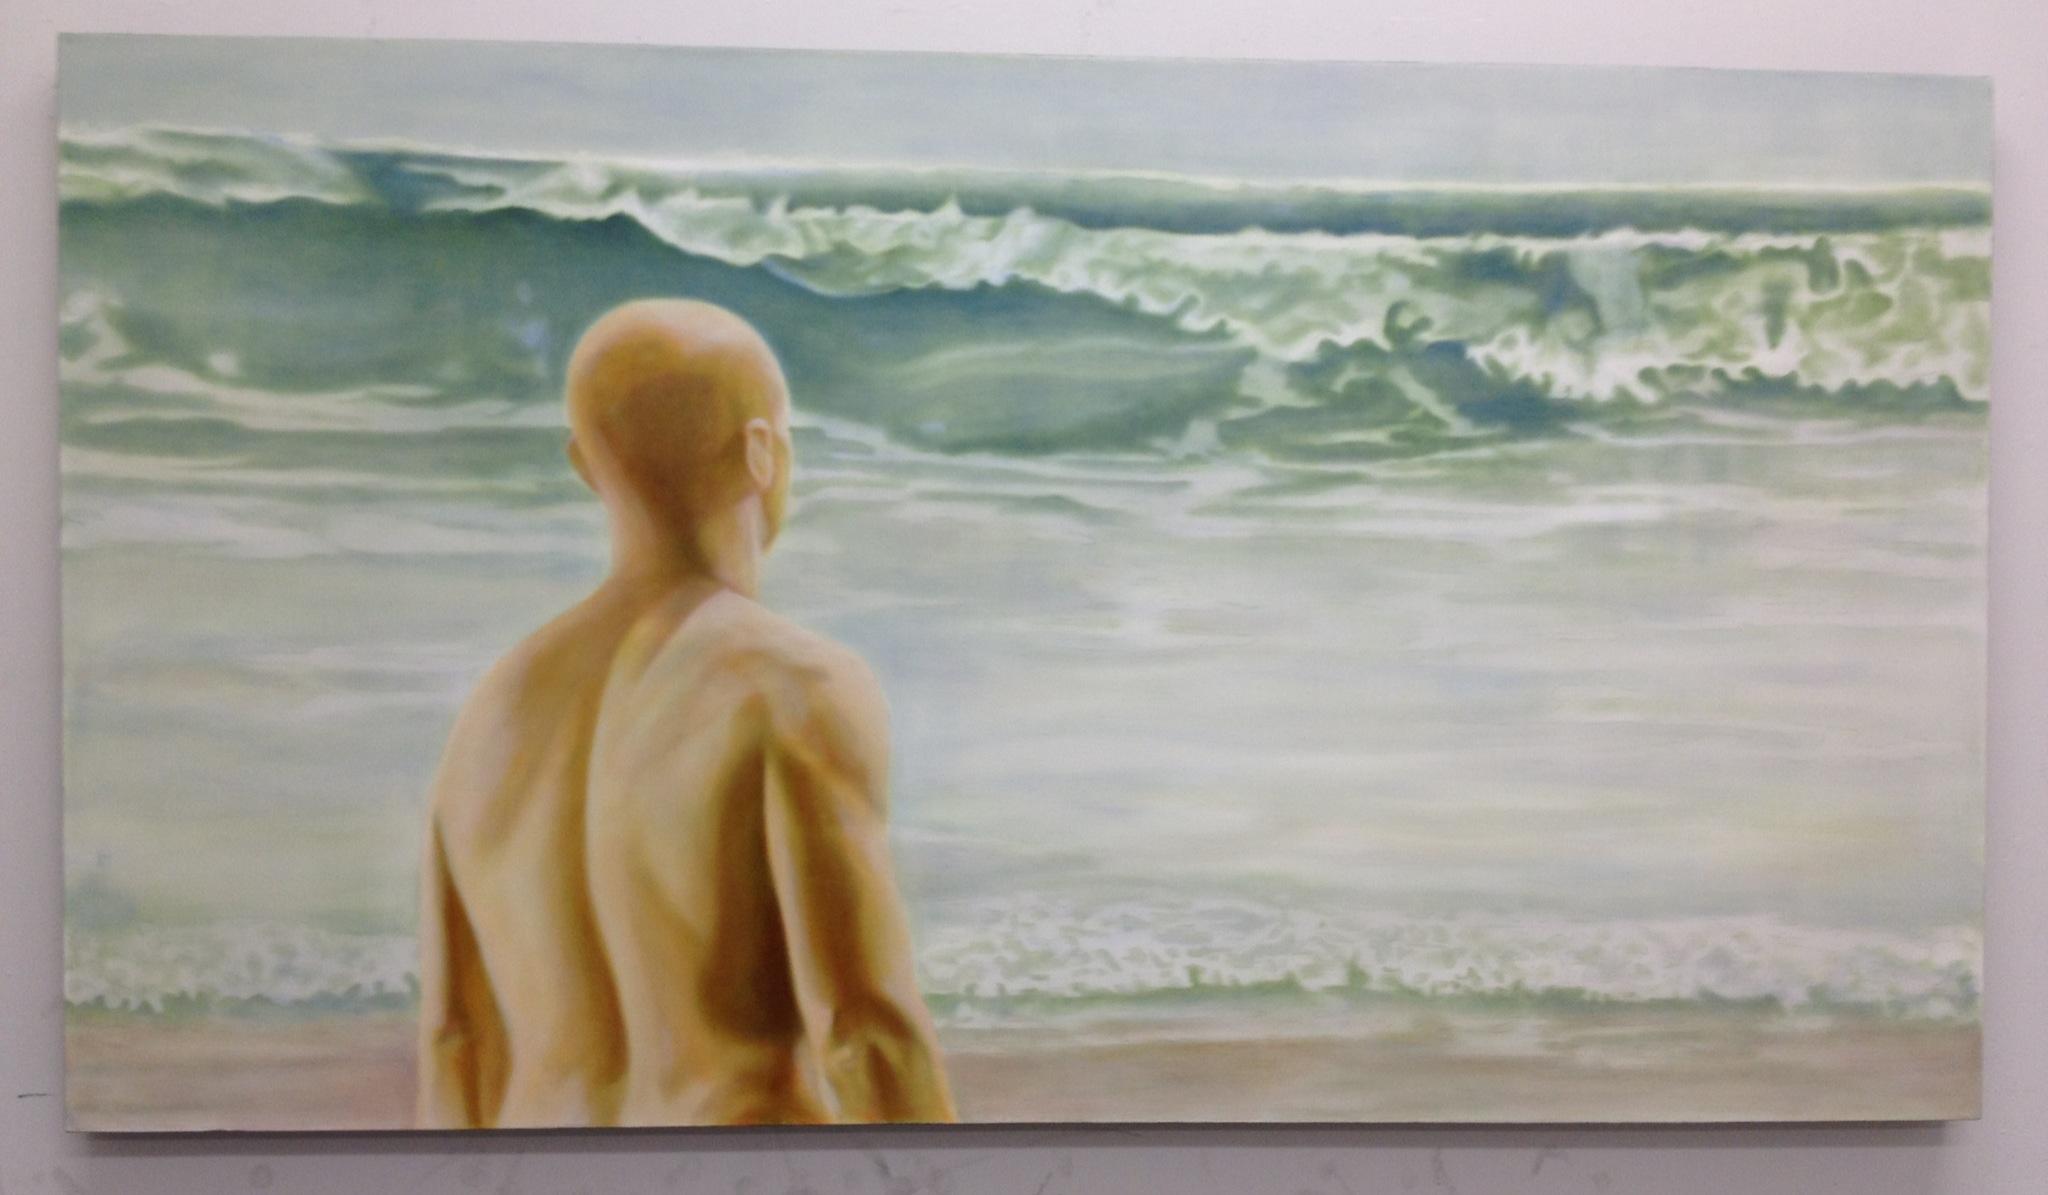 """Origin - North Beach, Haida Gwaii"" ©2012 Janice Tanton. Work In Progress. 40x72. Oil on linen."